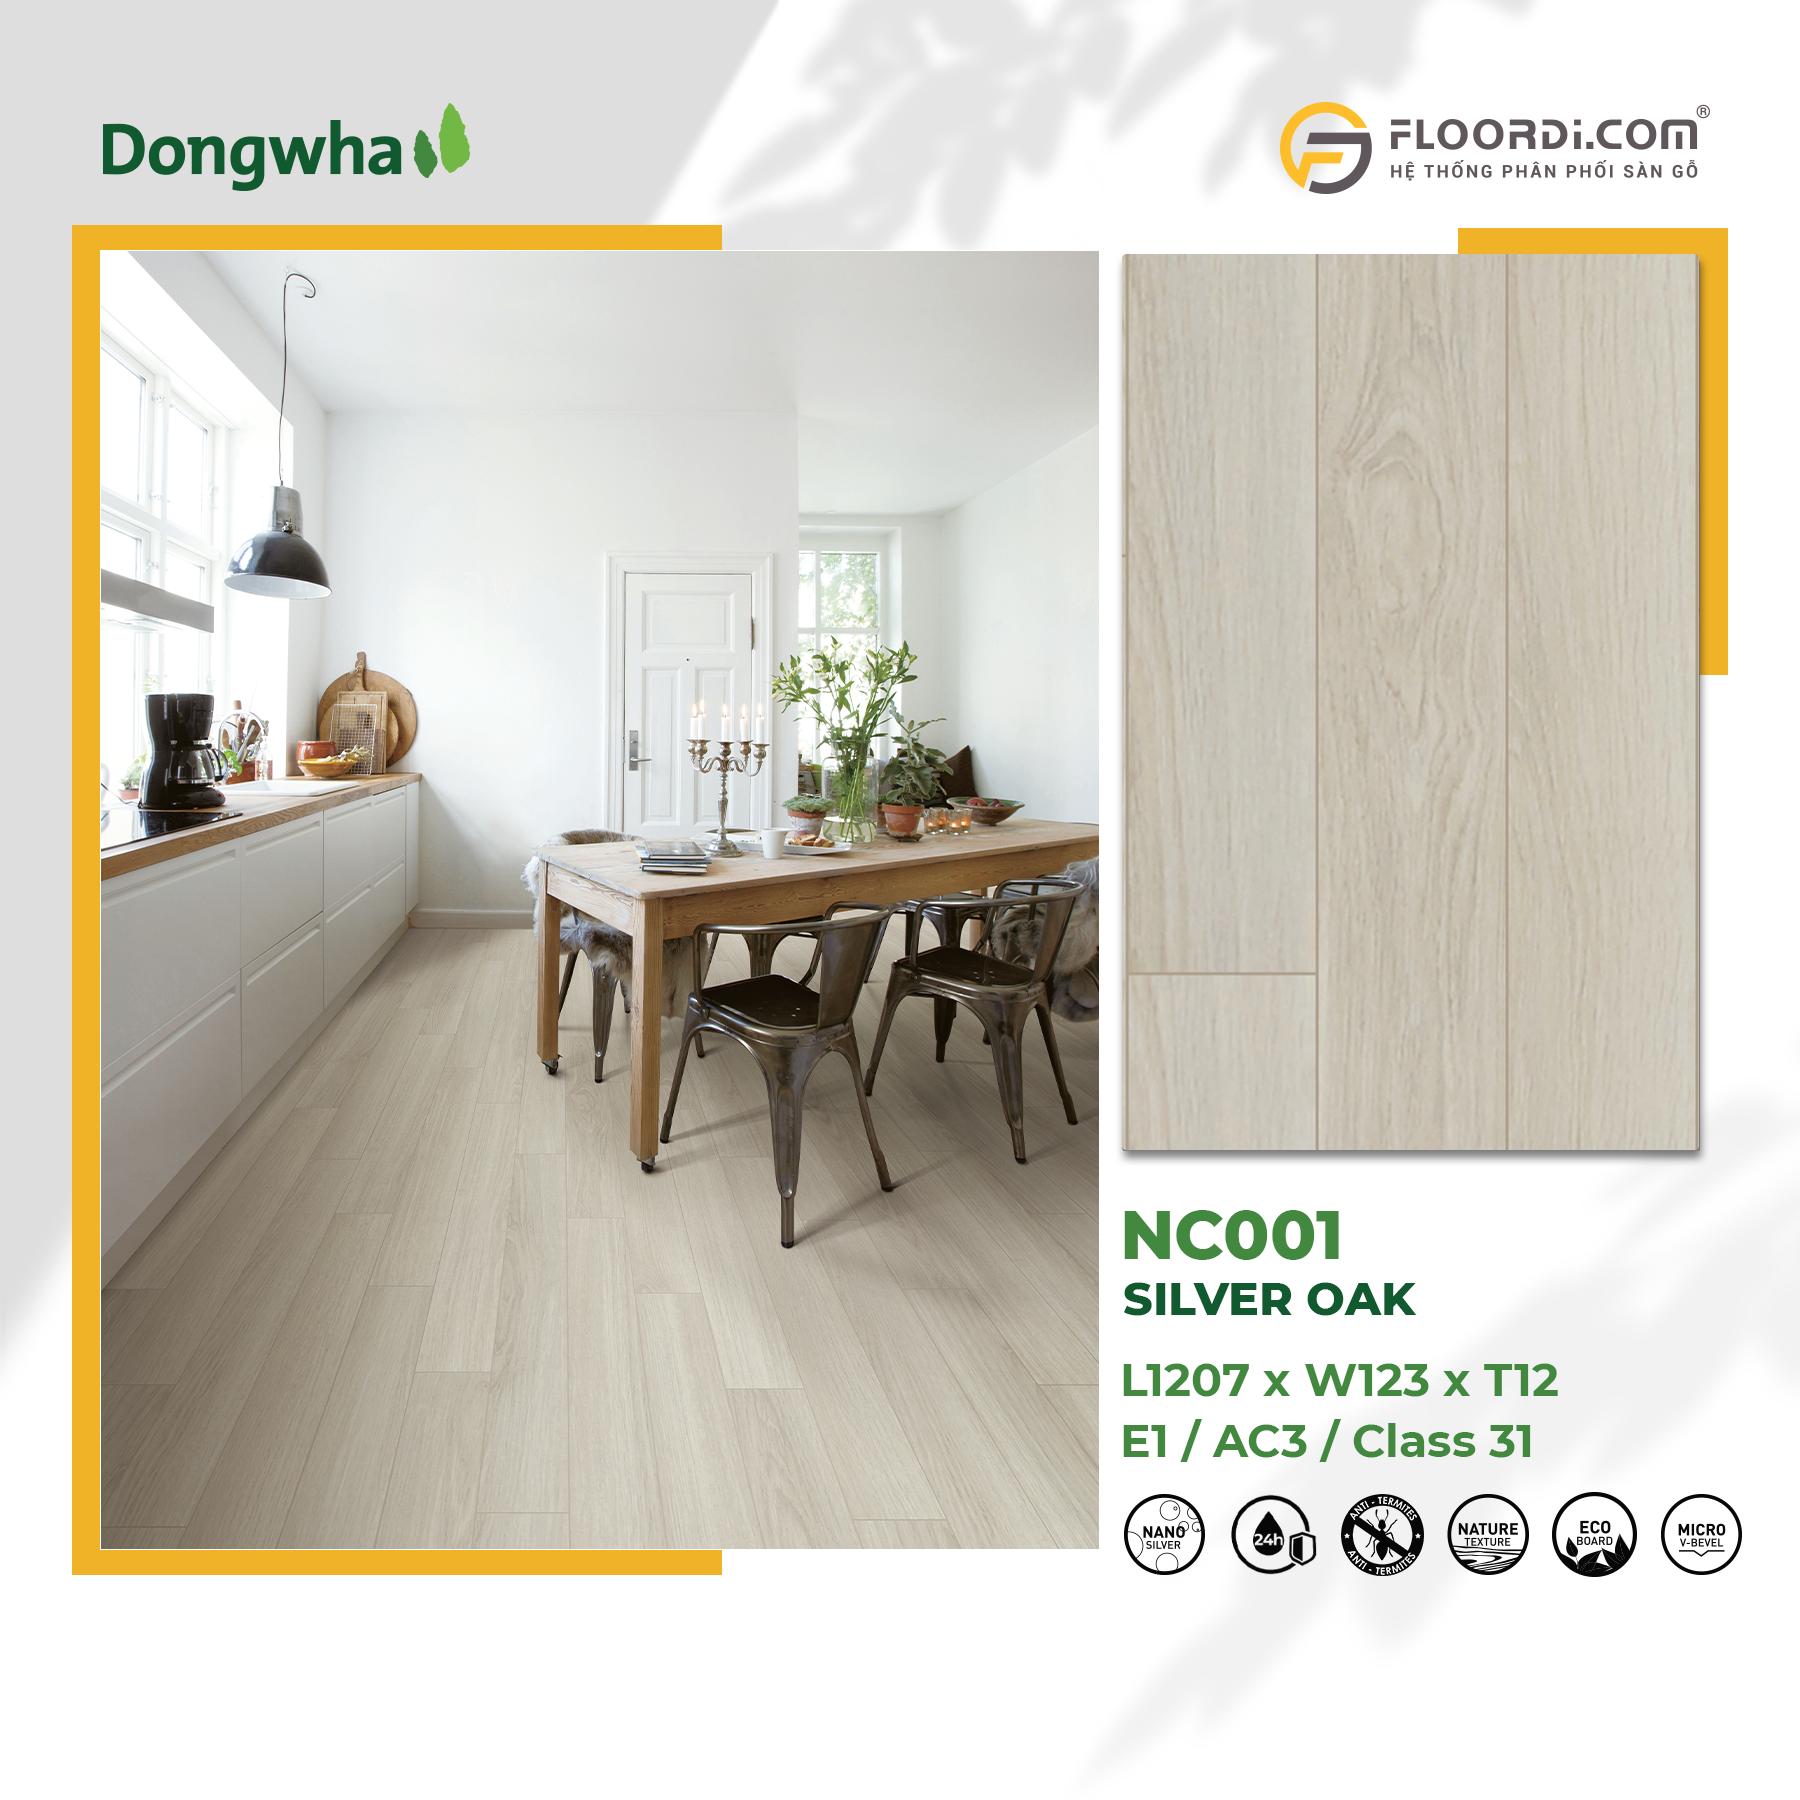 Album Dongwha 1800x1800 NC001 Silver Oak 052021